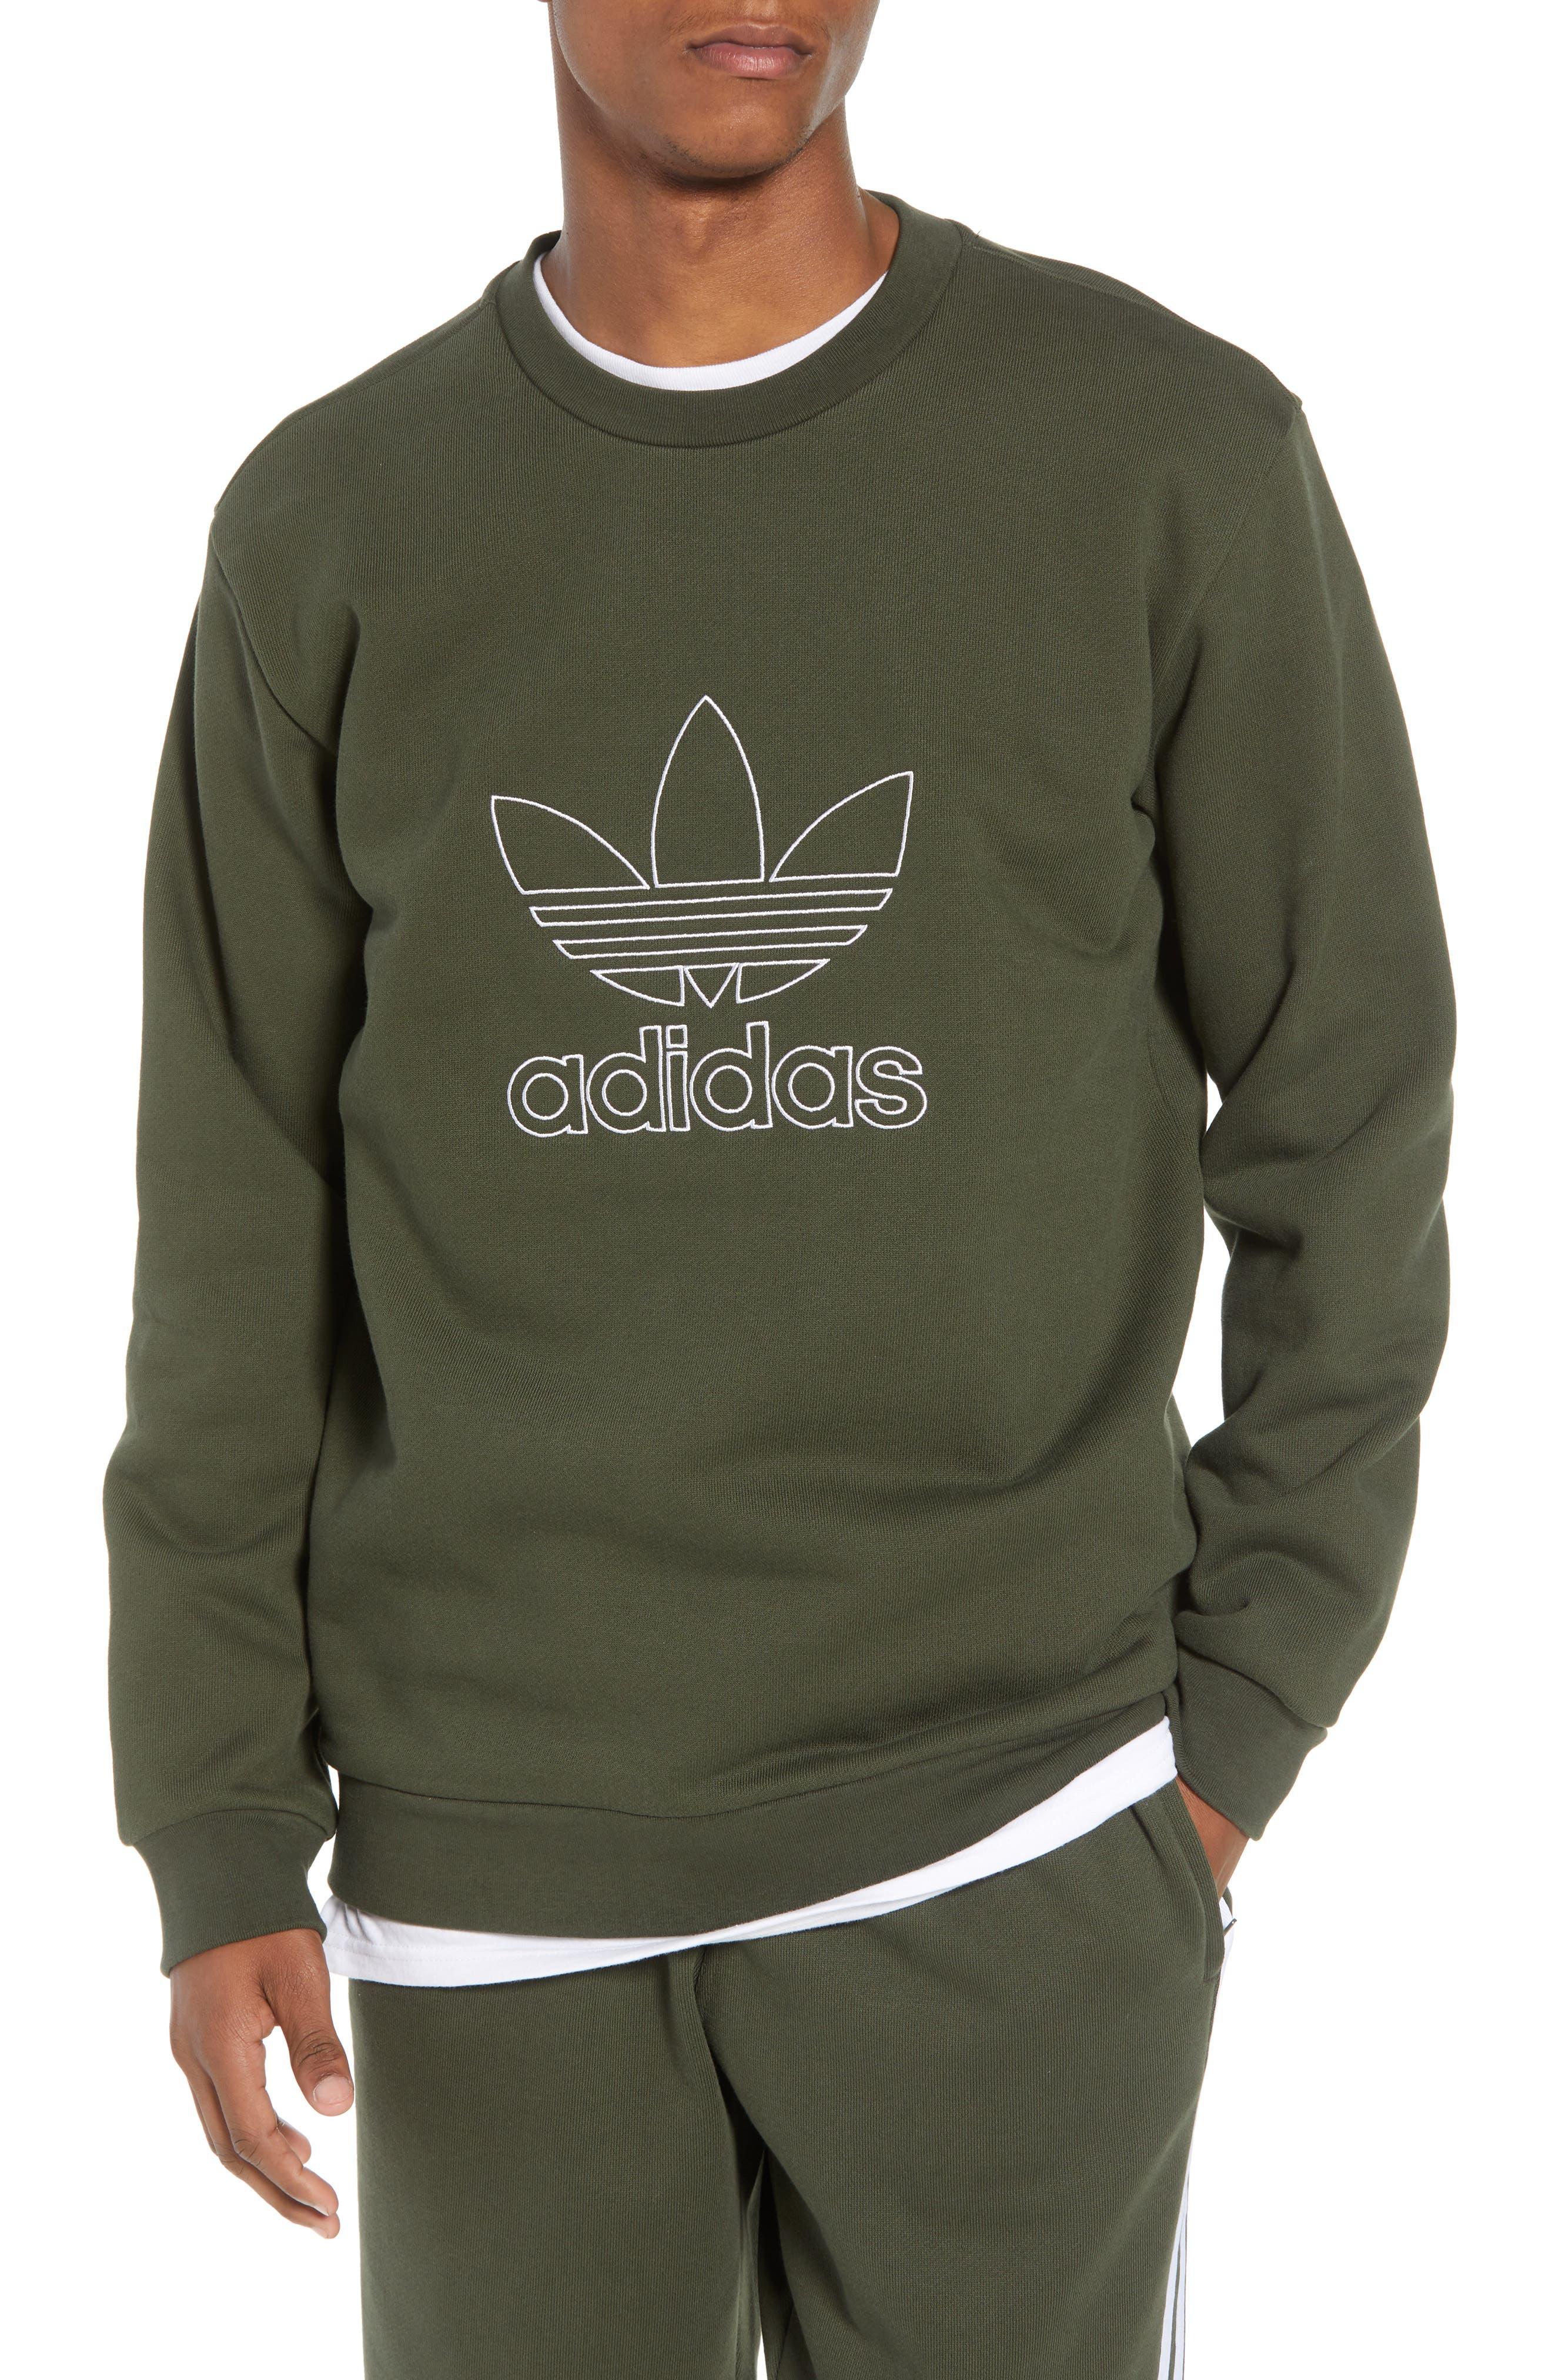 adidas Outline Trefoil Crewneck Sweatshirt,                         Main,                         color, 307